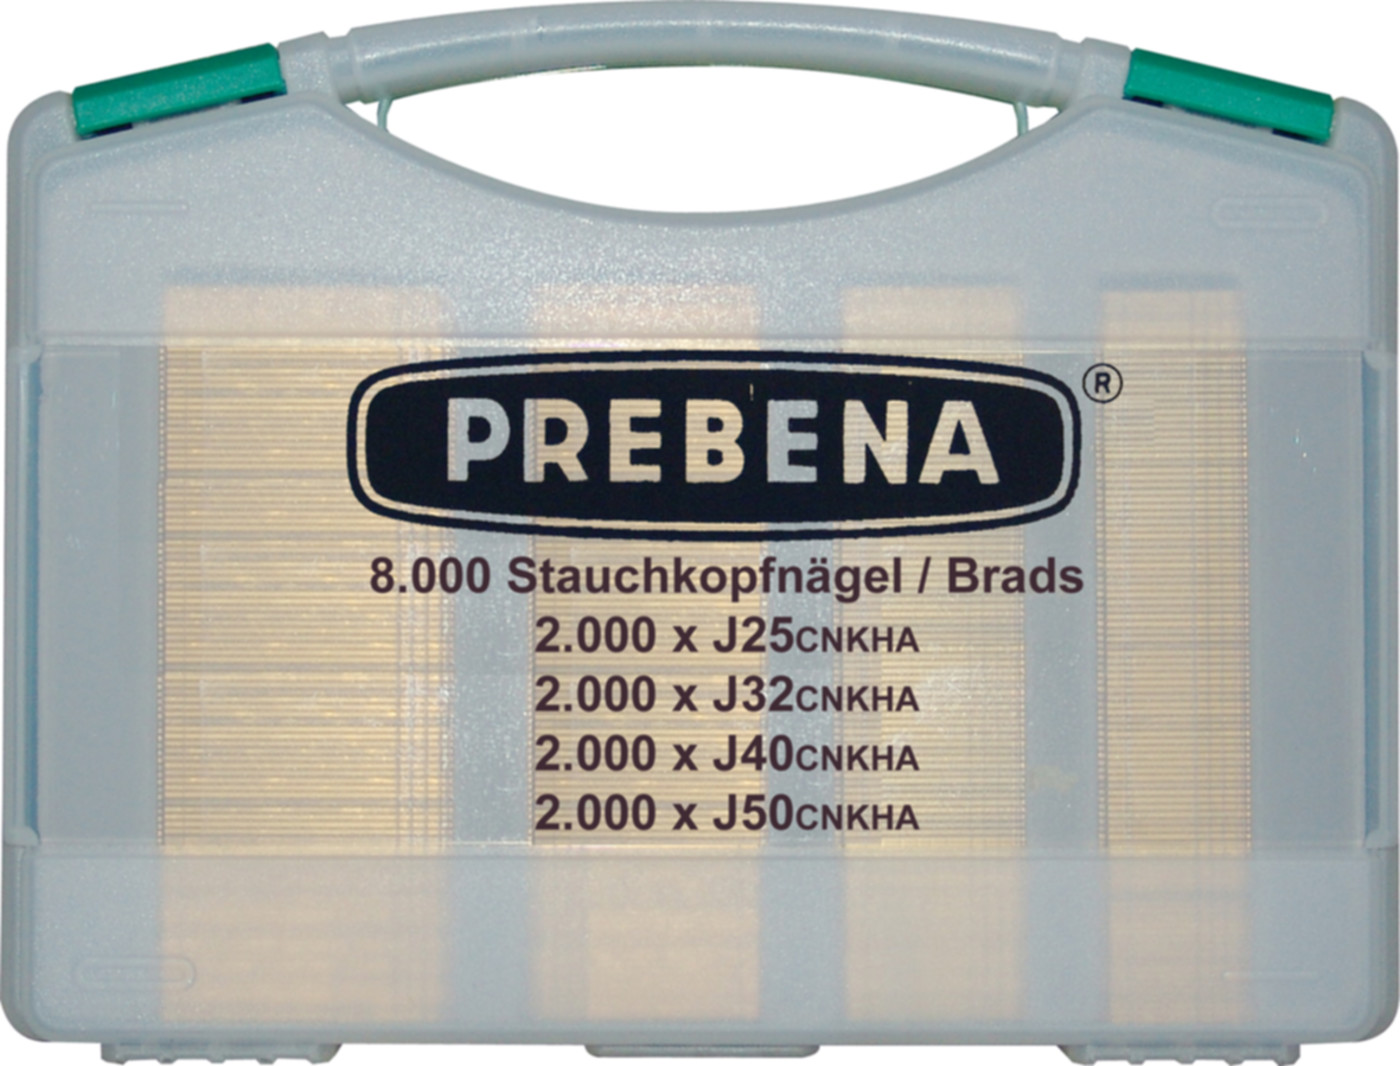 stauchkopfnägel j-box : pr53.0150, prebena - qualitativ hochwertige